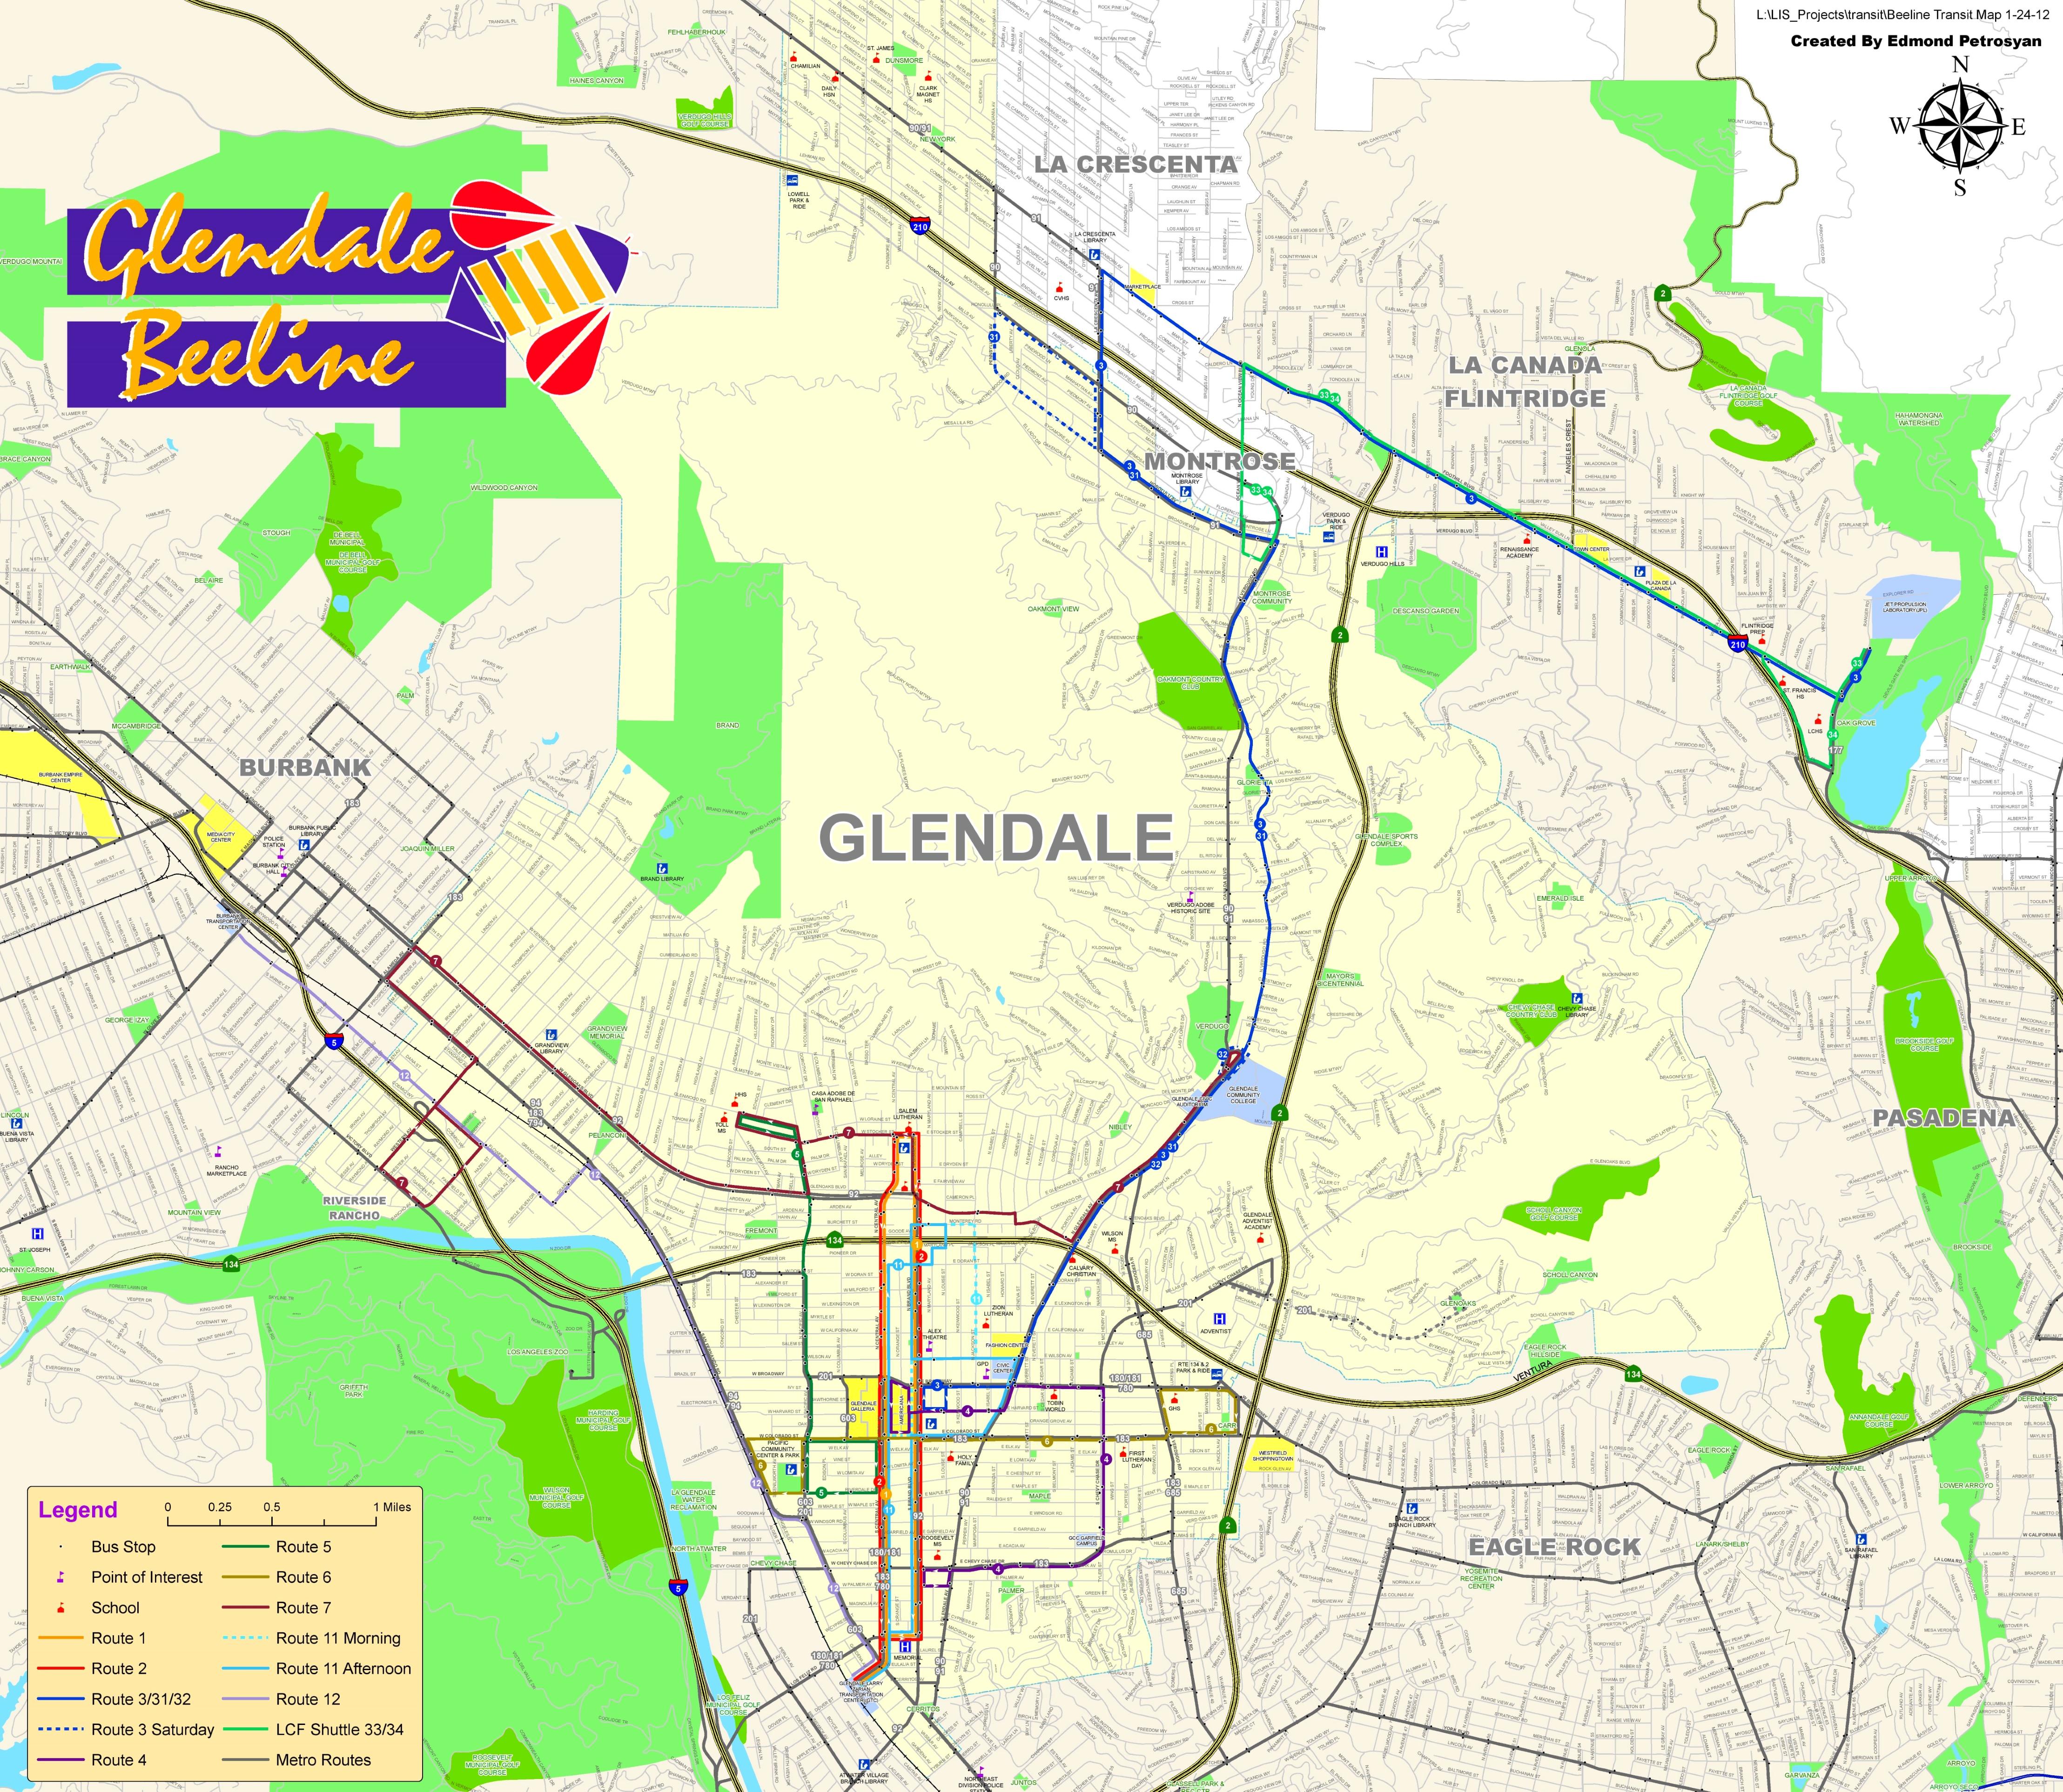 Glendale Beeline Map